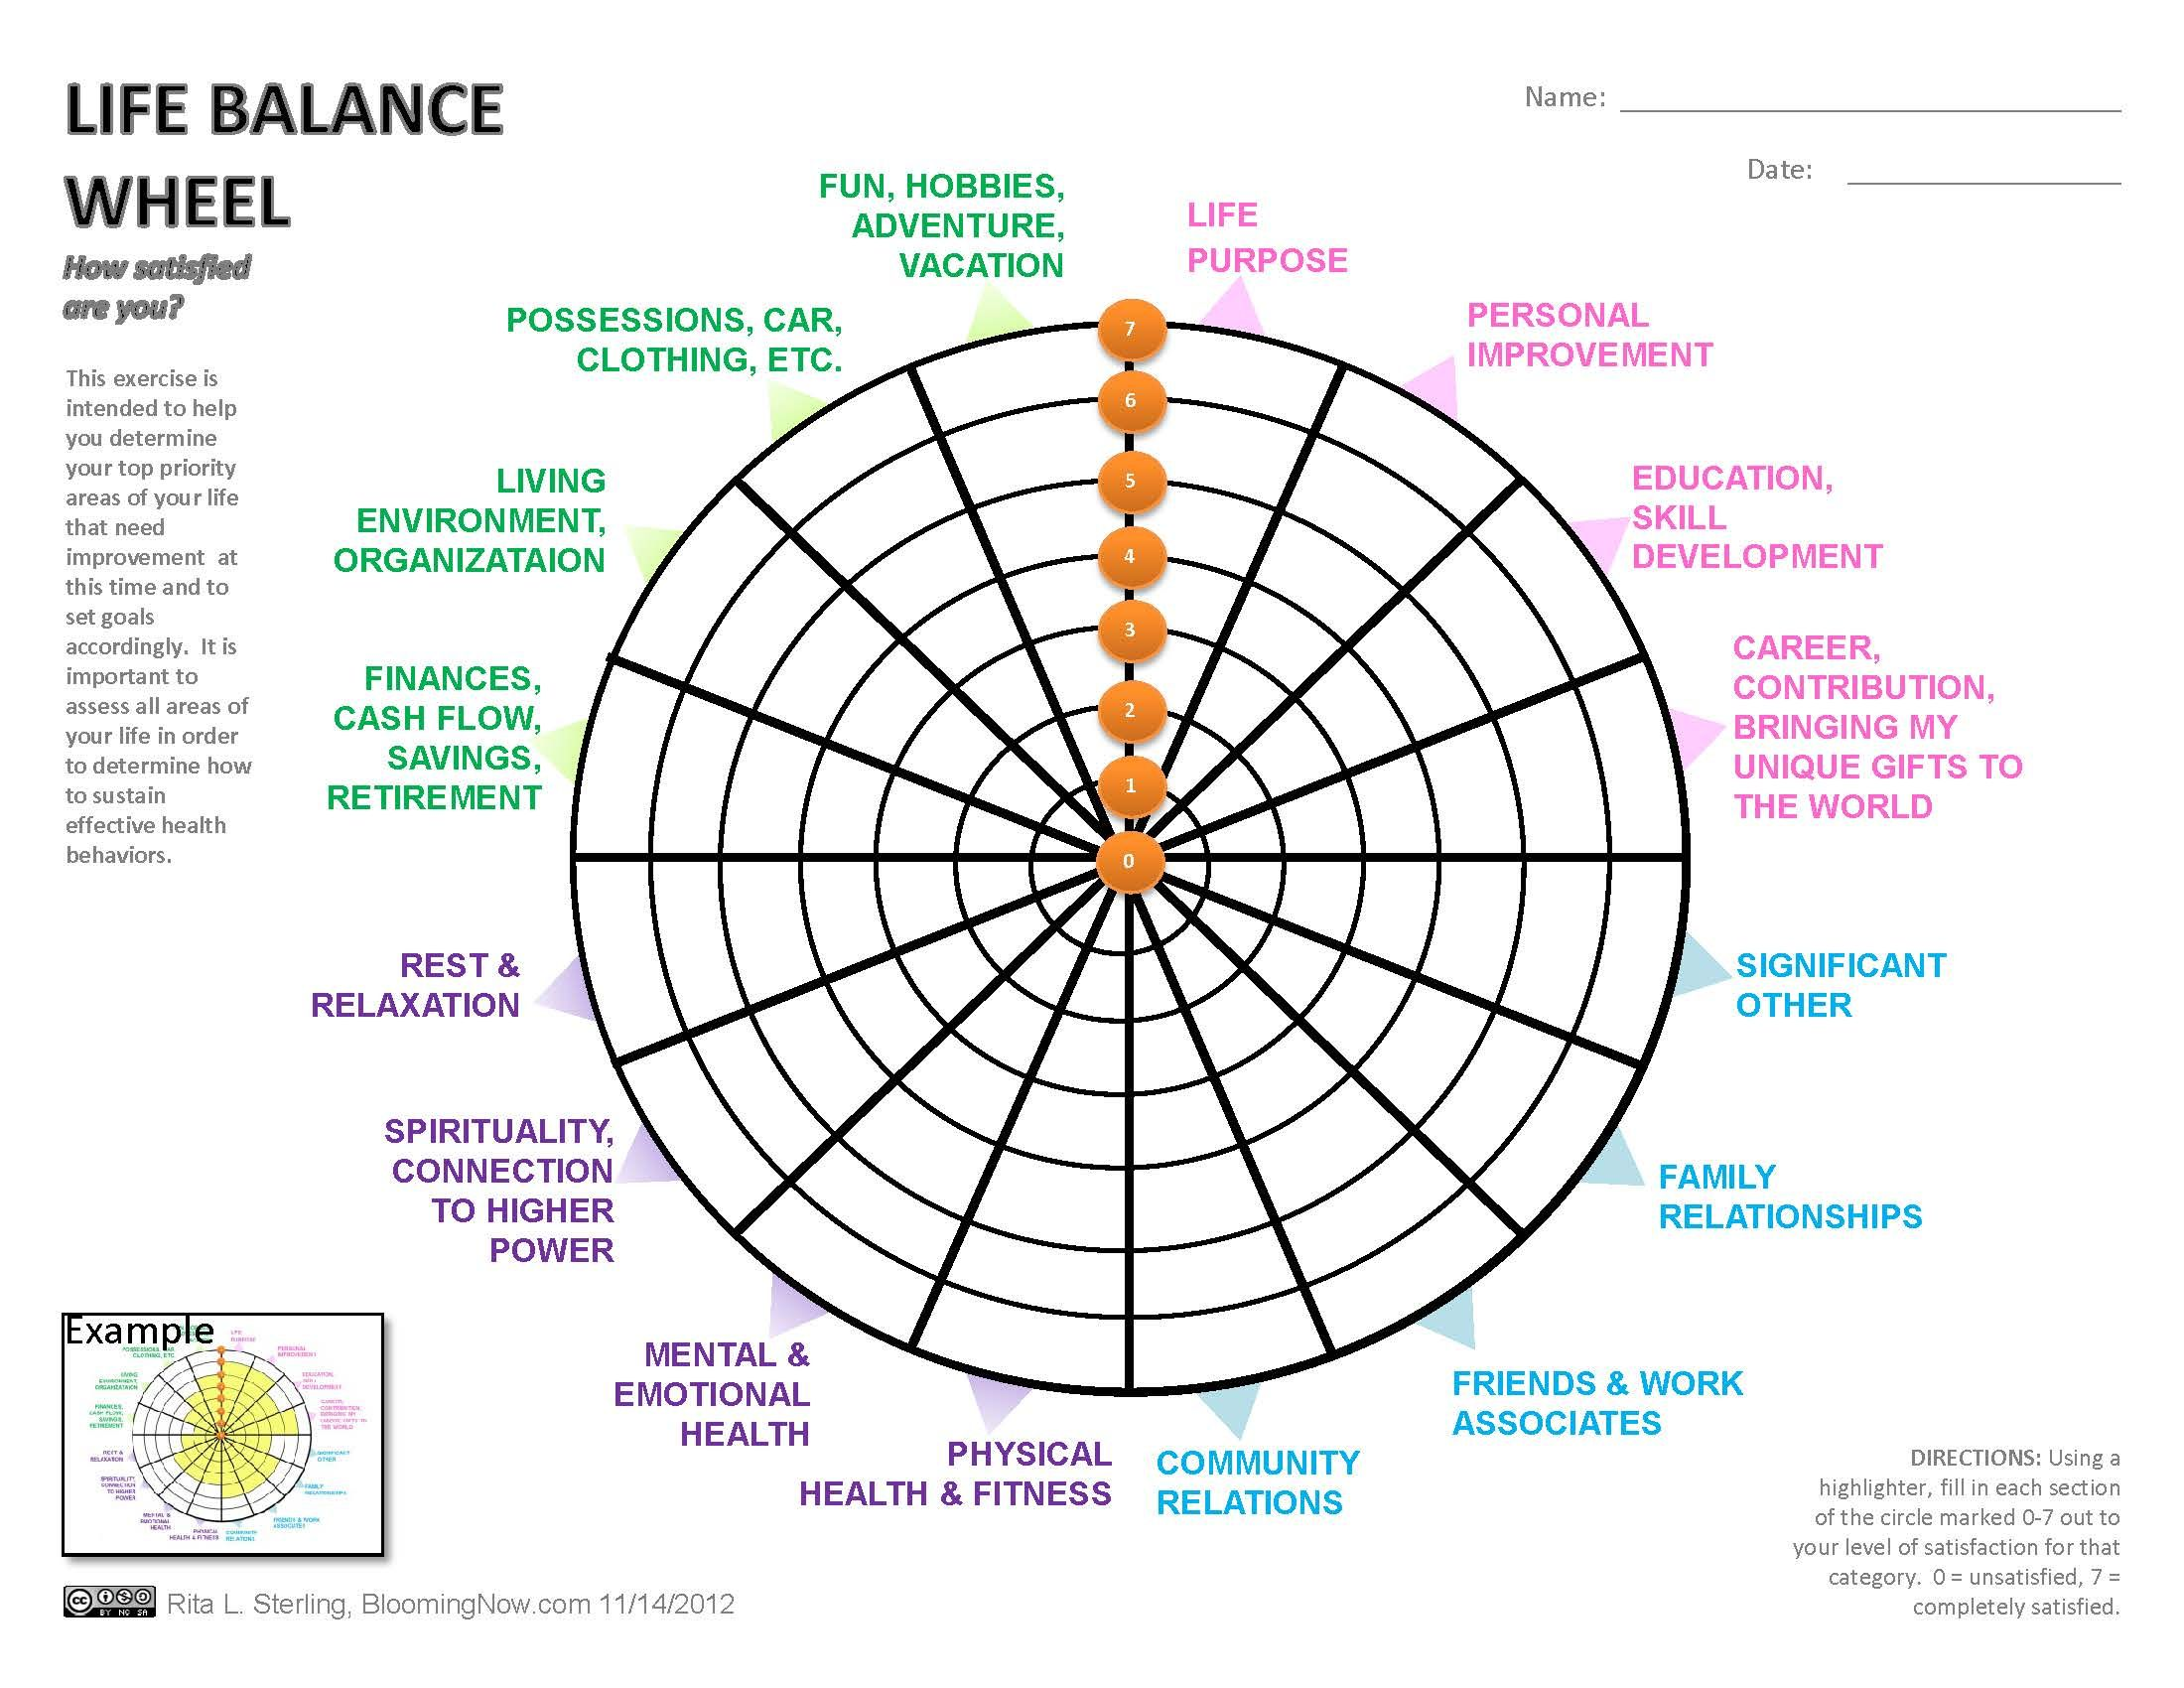 Life Balance Wheel 2 200 1 700 Pixels